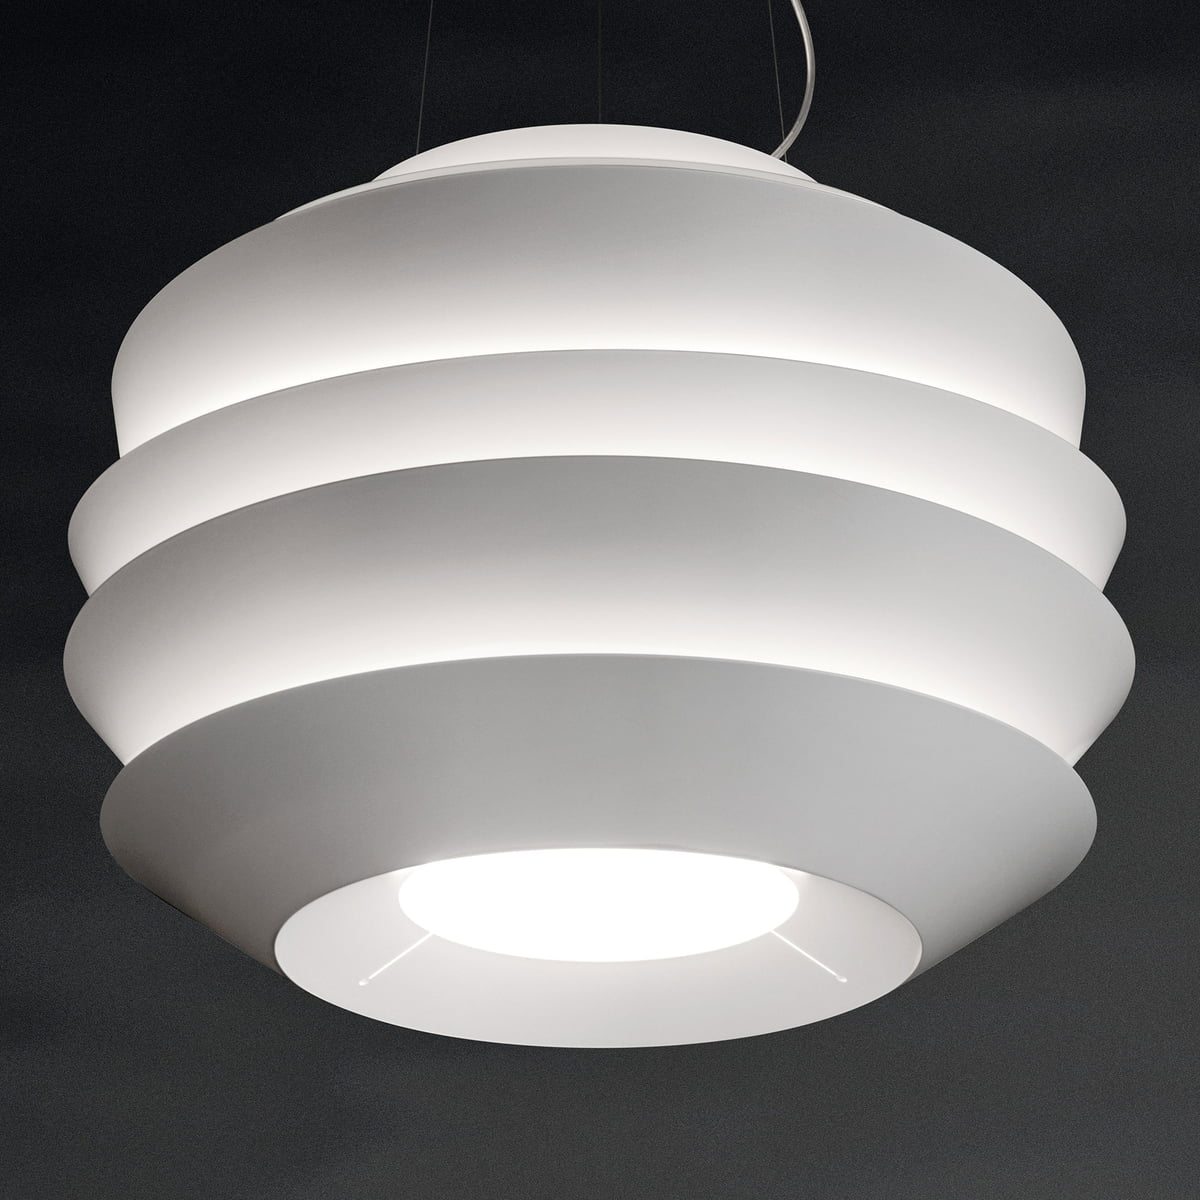 foscarini le soleil pendant lamp foscarini connox. Black Bedroom Furniture Sets. Home Design Ideas